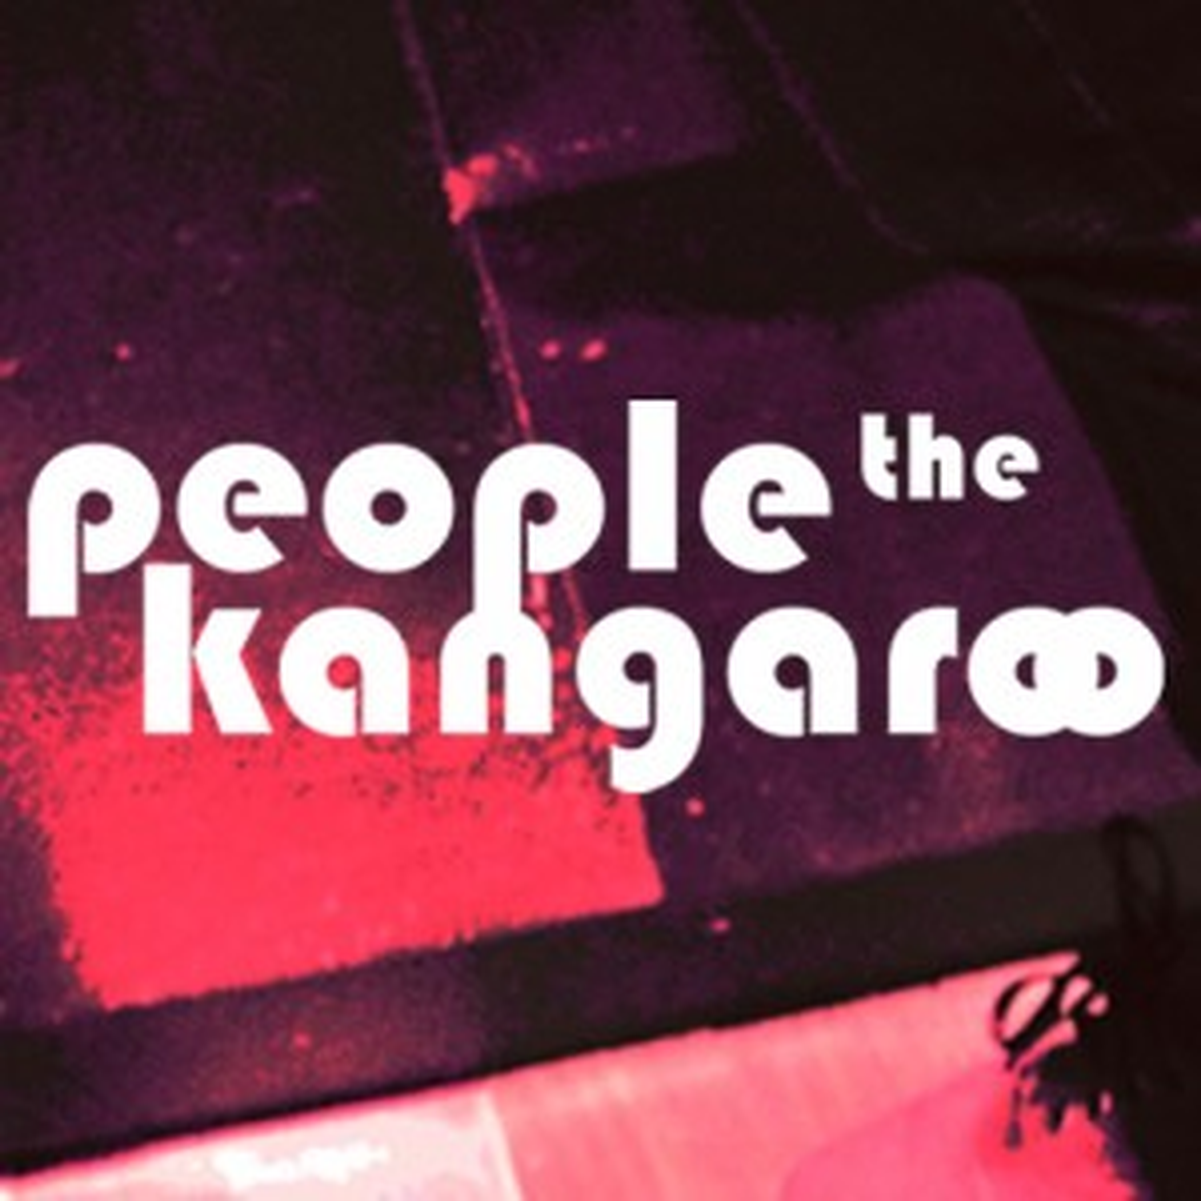 People The Kangaroo